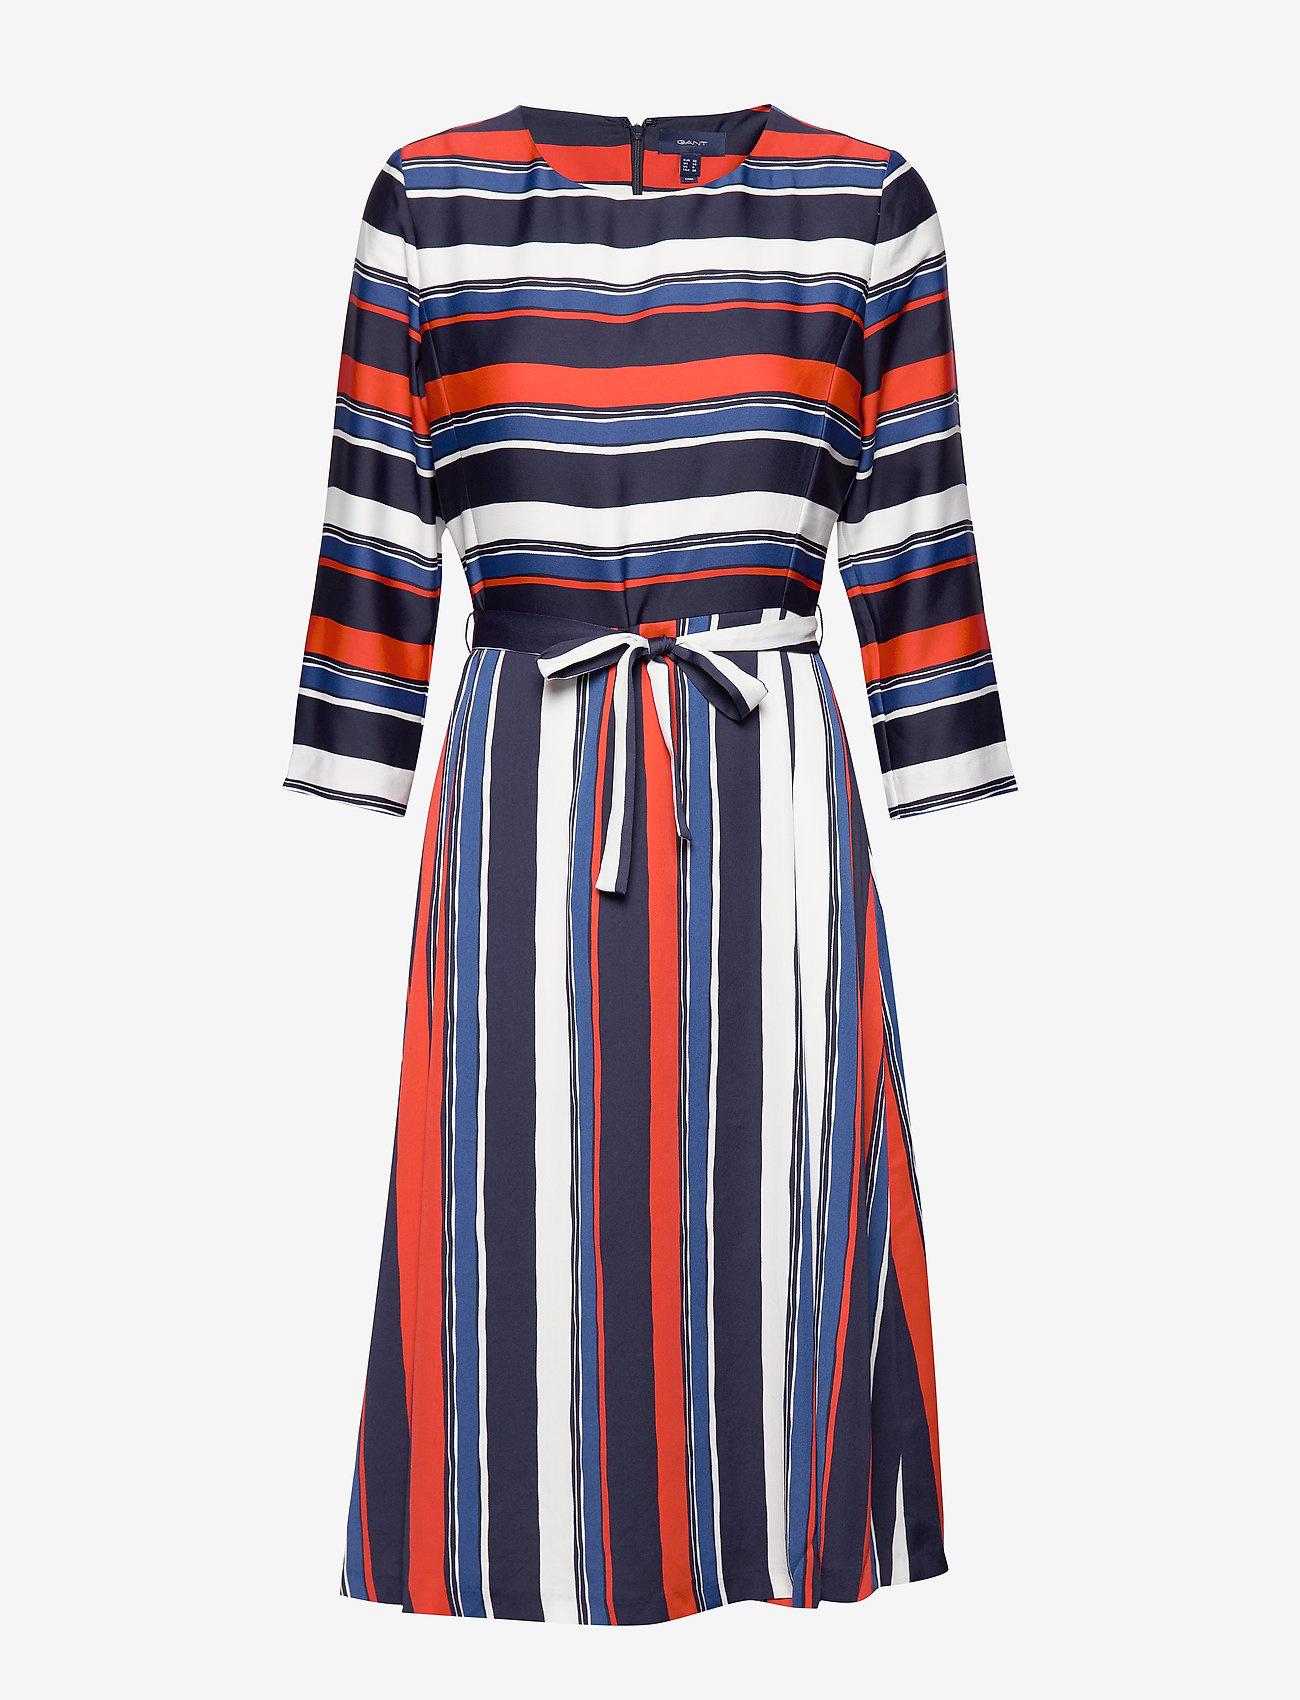 GANT  Dames A-lijn jurk, multi